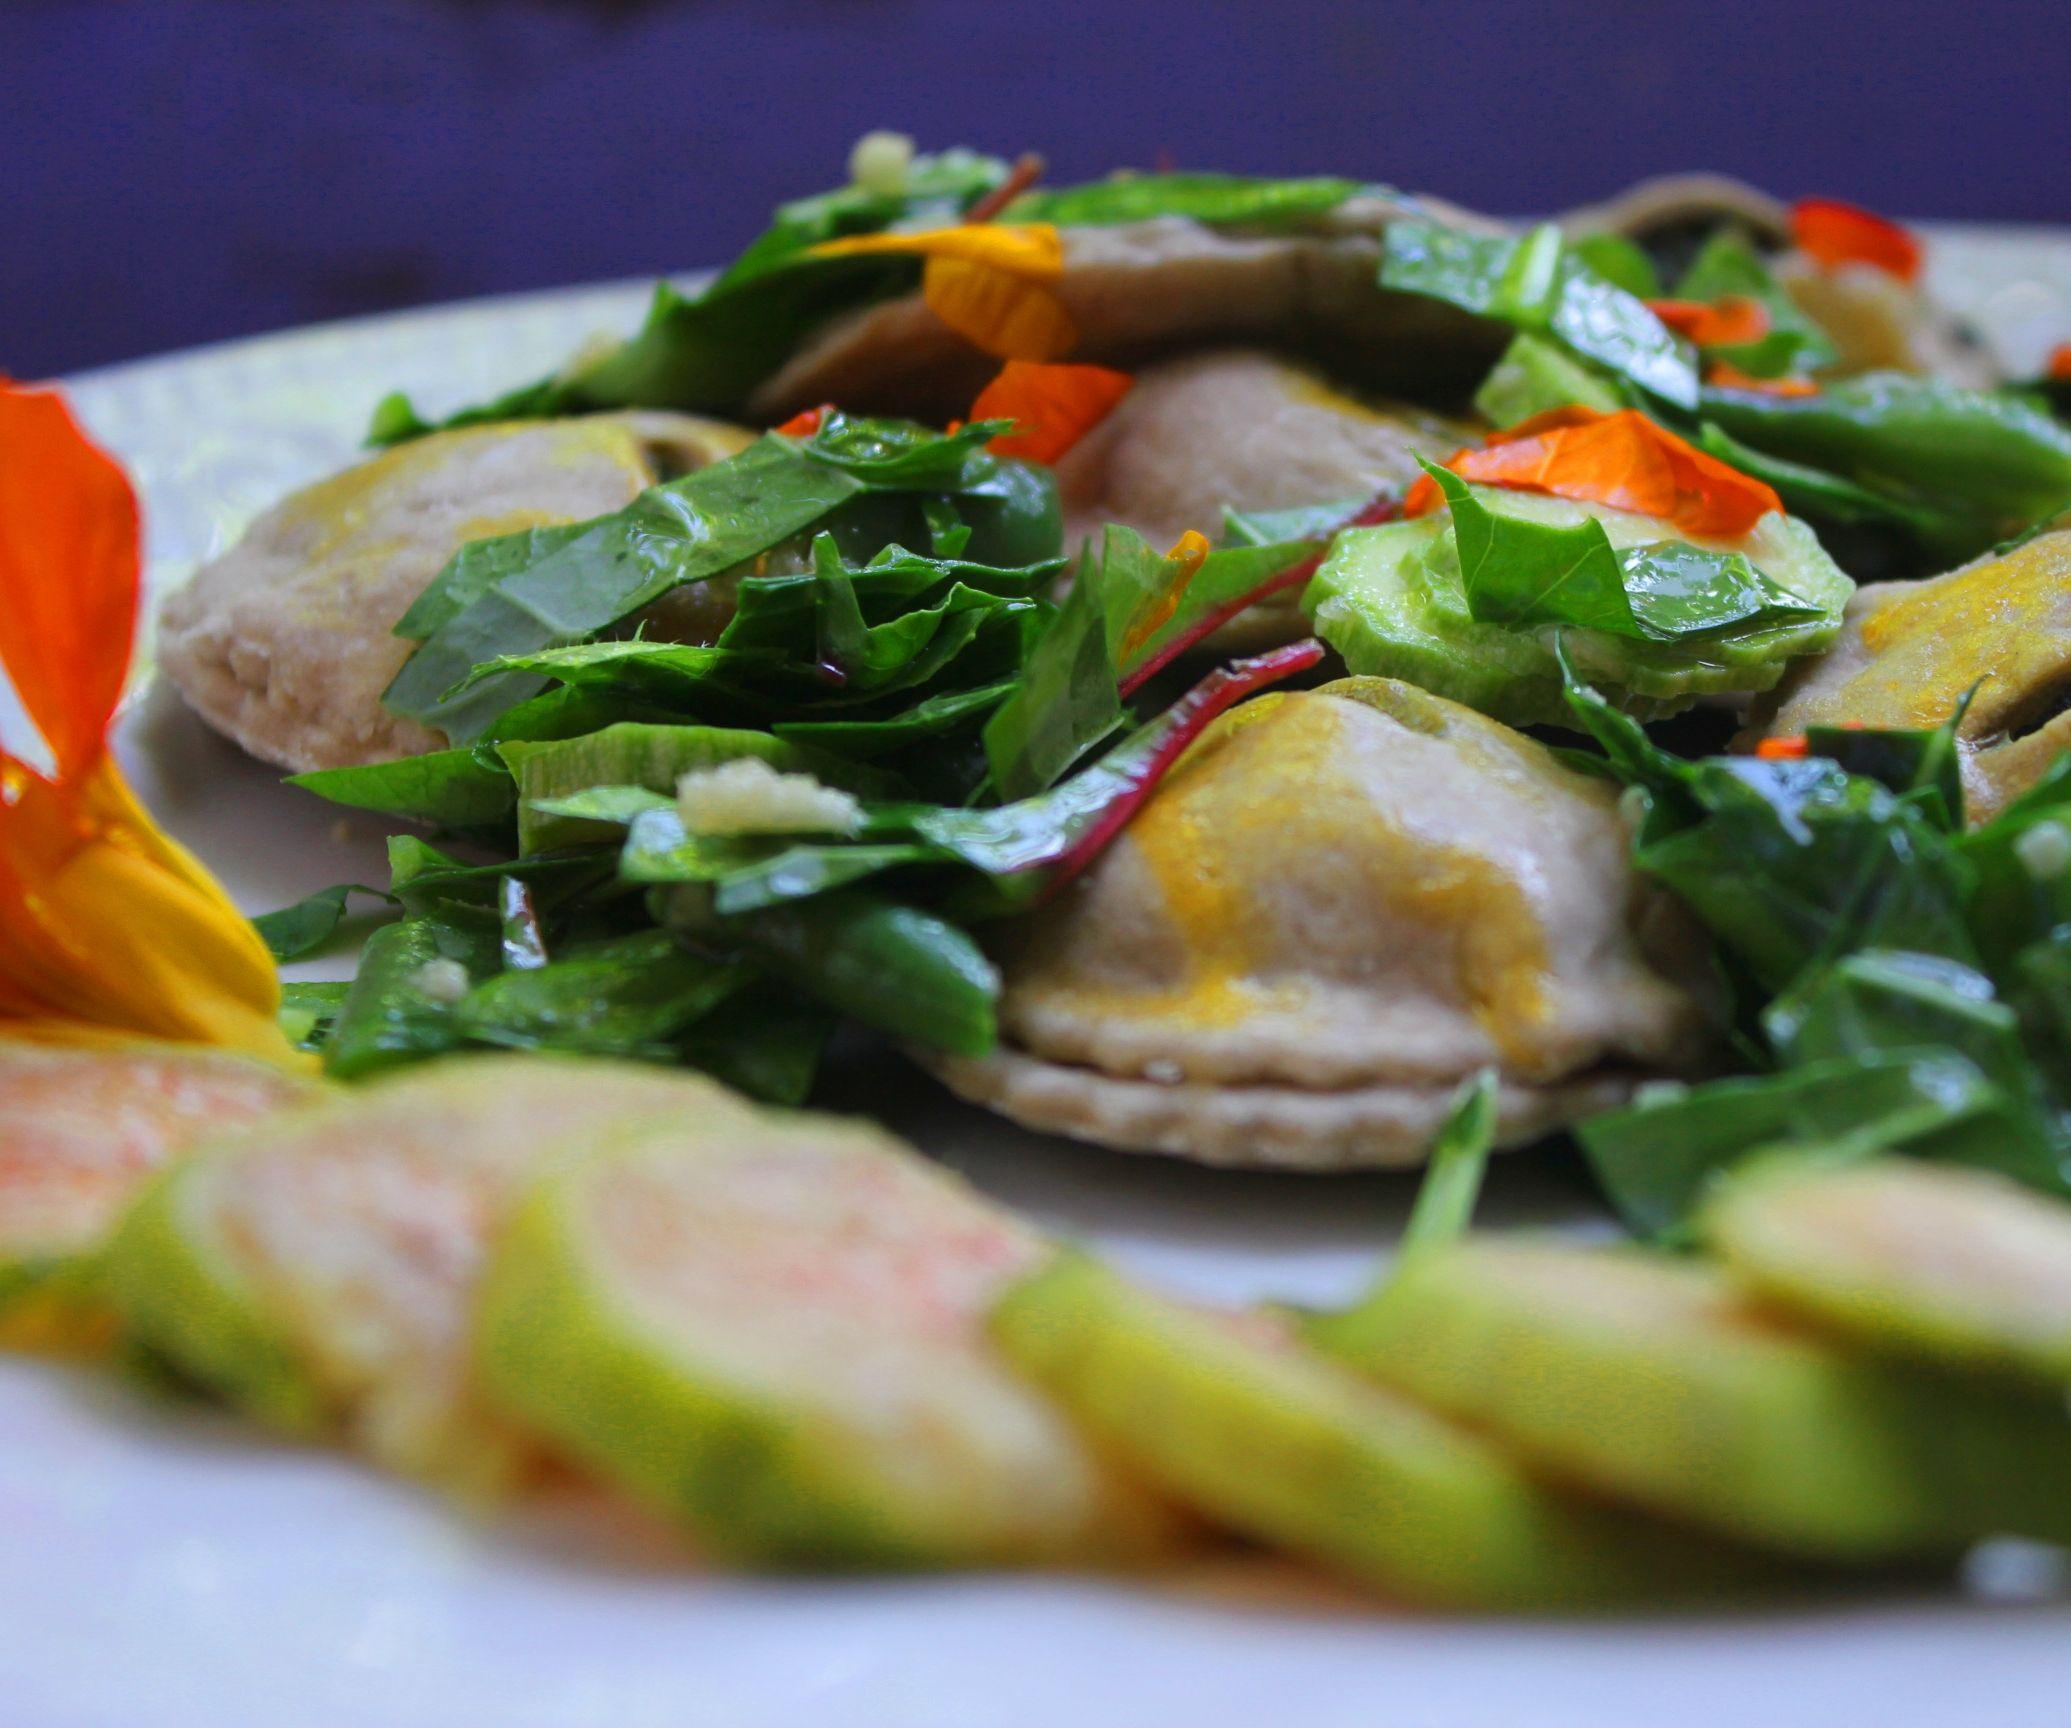 Oven-baked ravioli - Caciatelli or Casciatelli molisani - a variation of this delicious sweet or savoury dish. Organic recipe